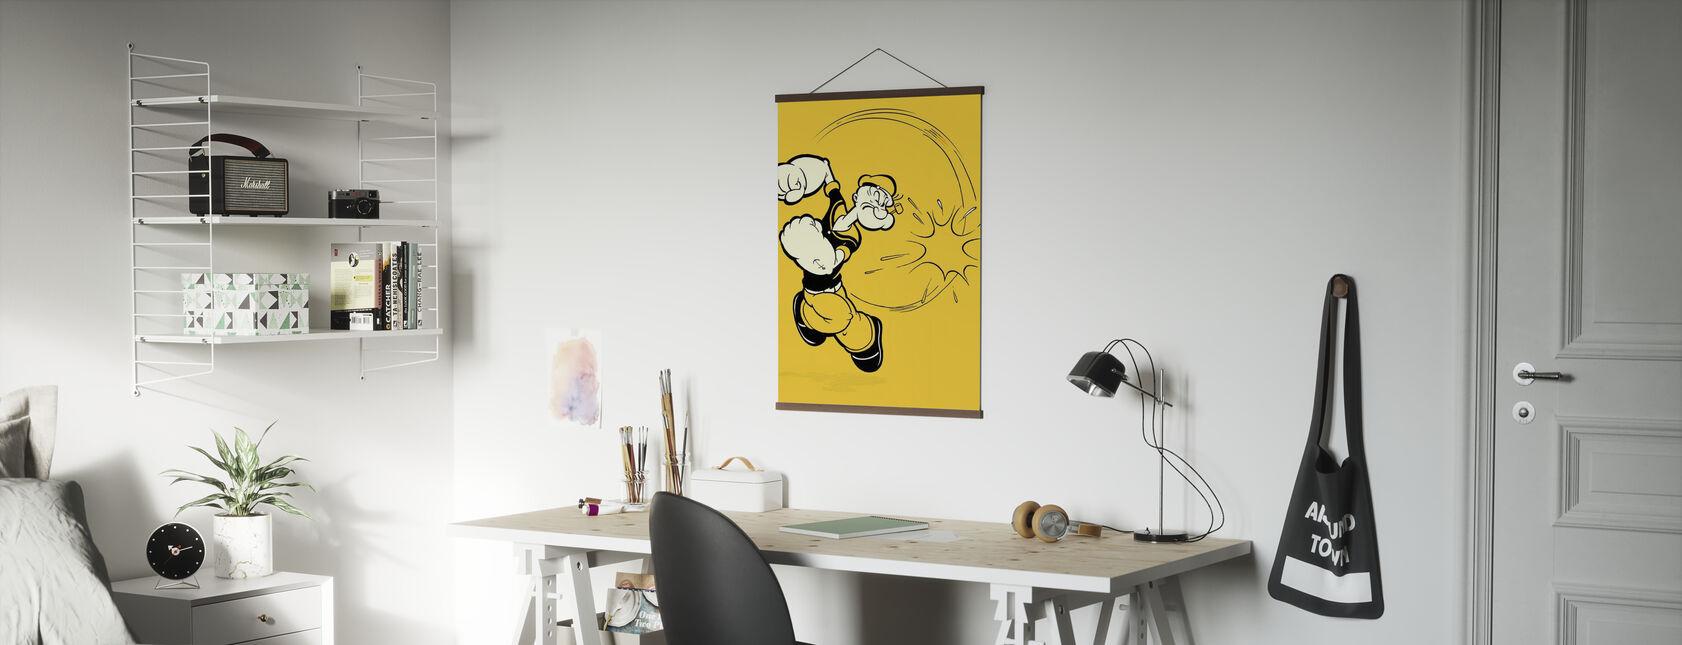 Popeye punsj - Plakat - Kontor